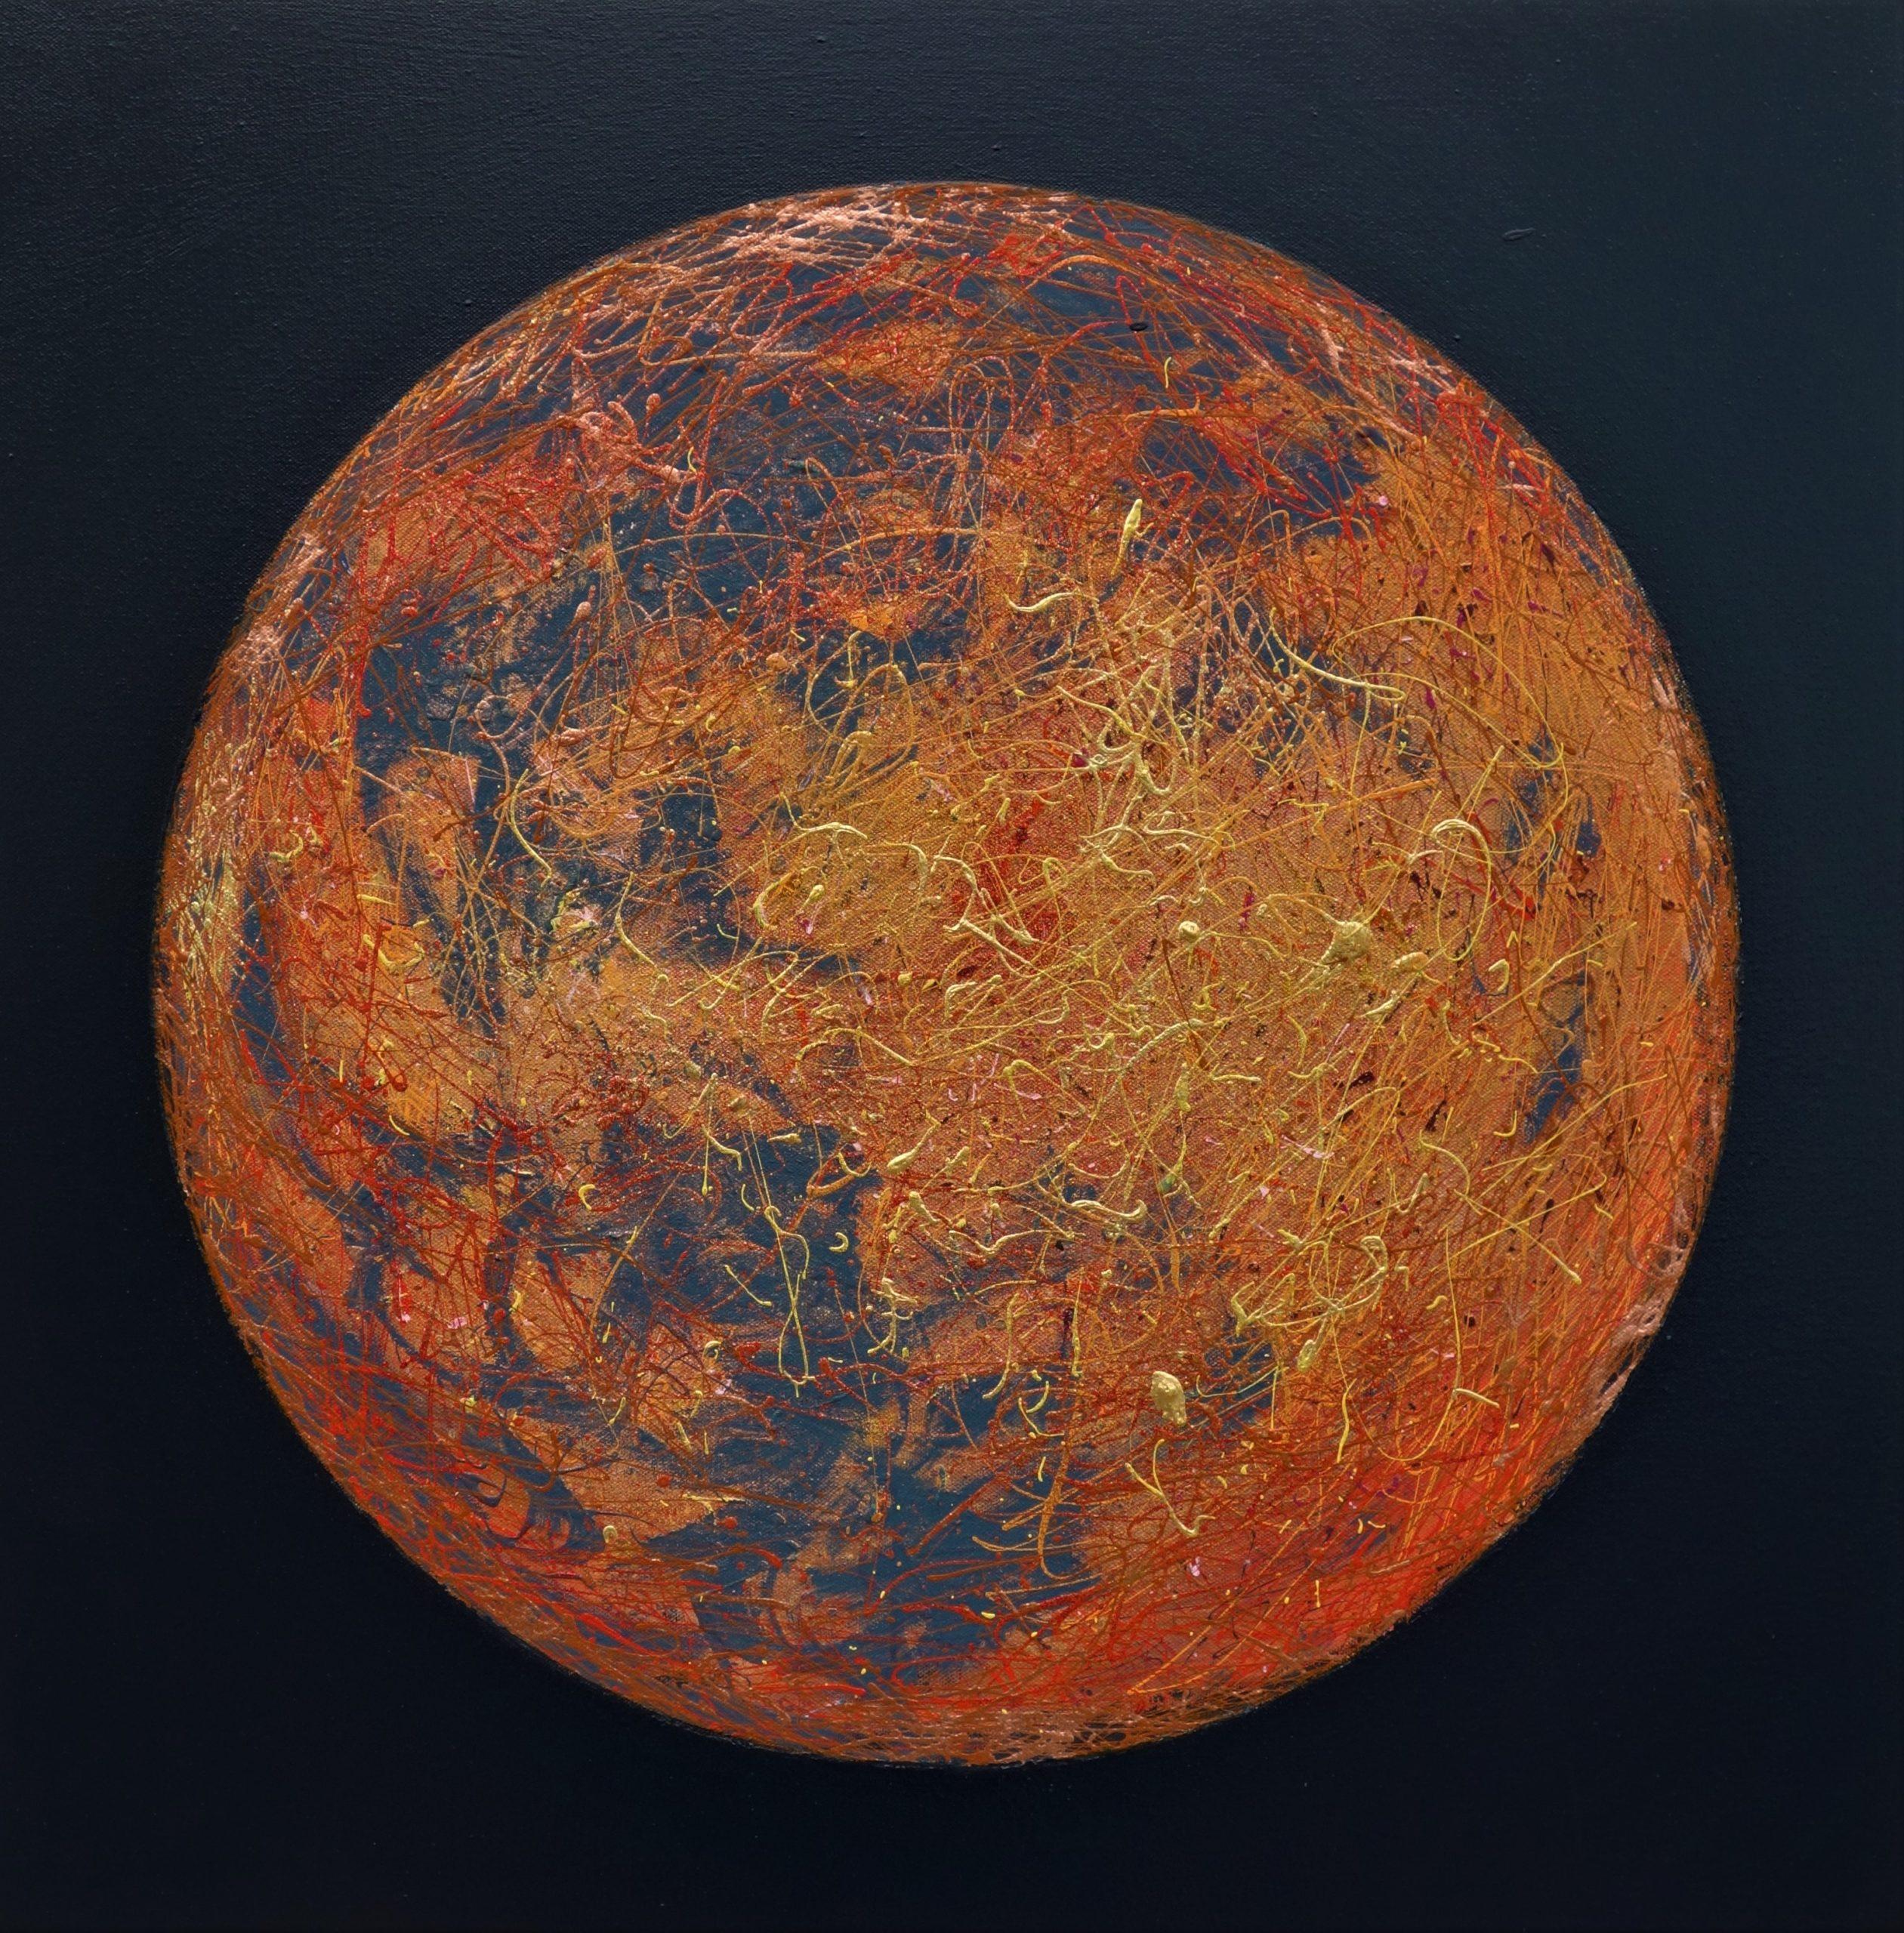 Mars by Sandi Westwood